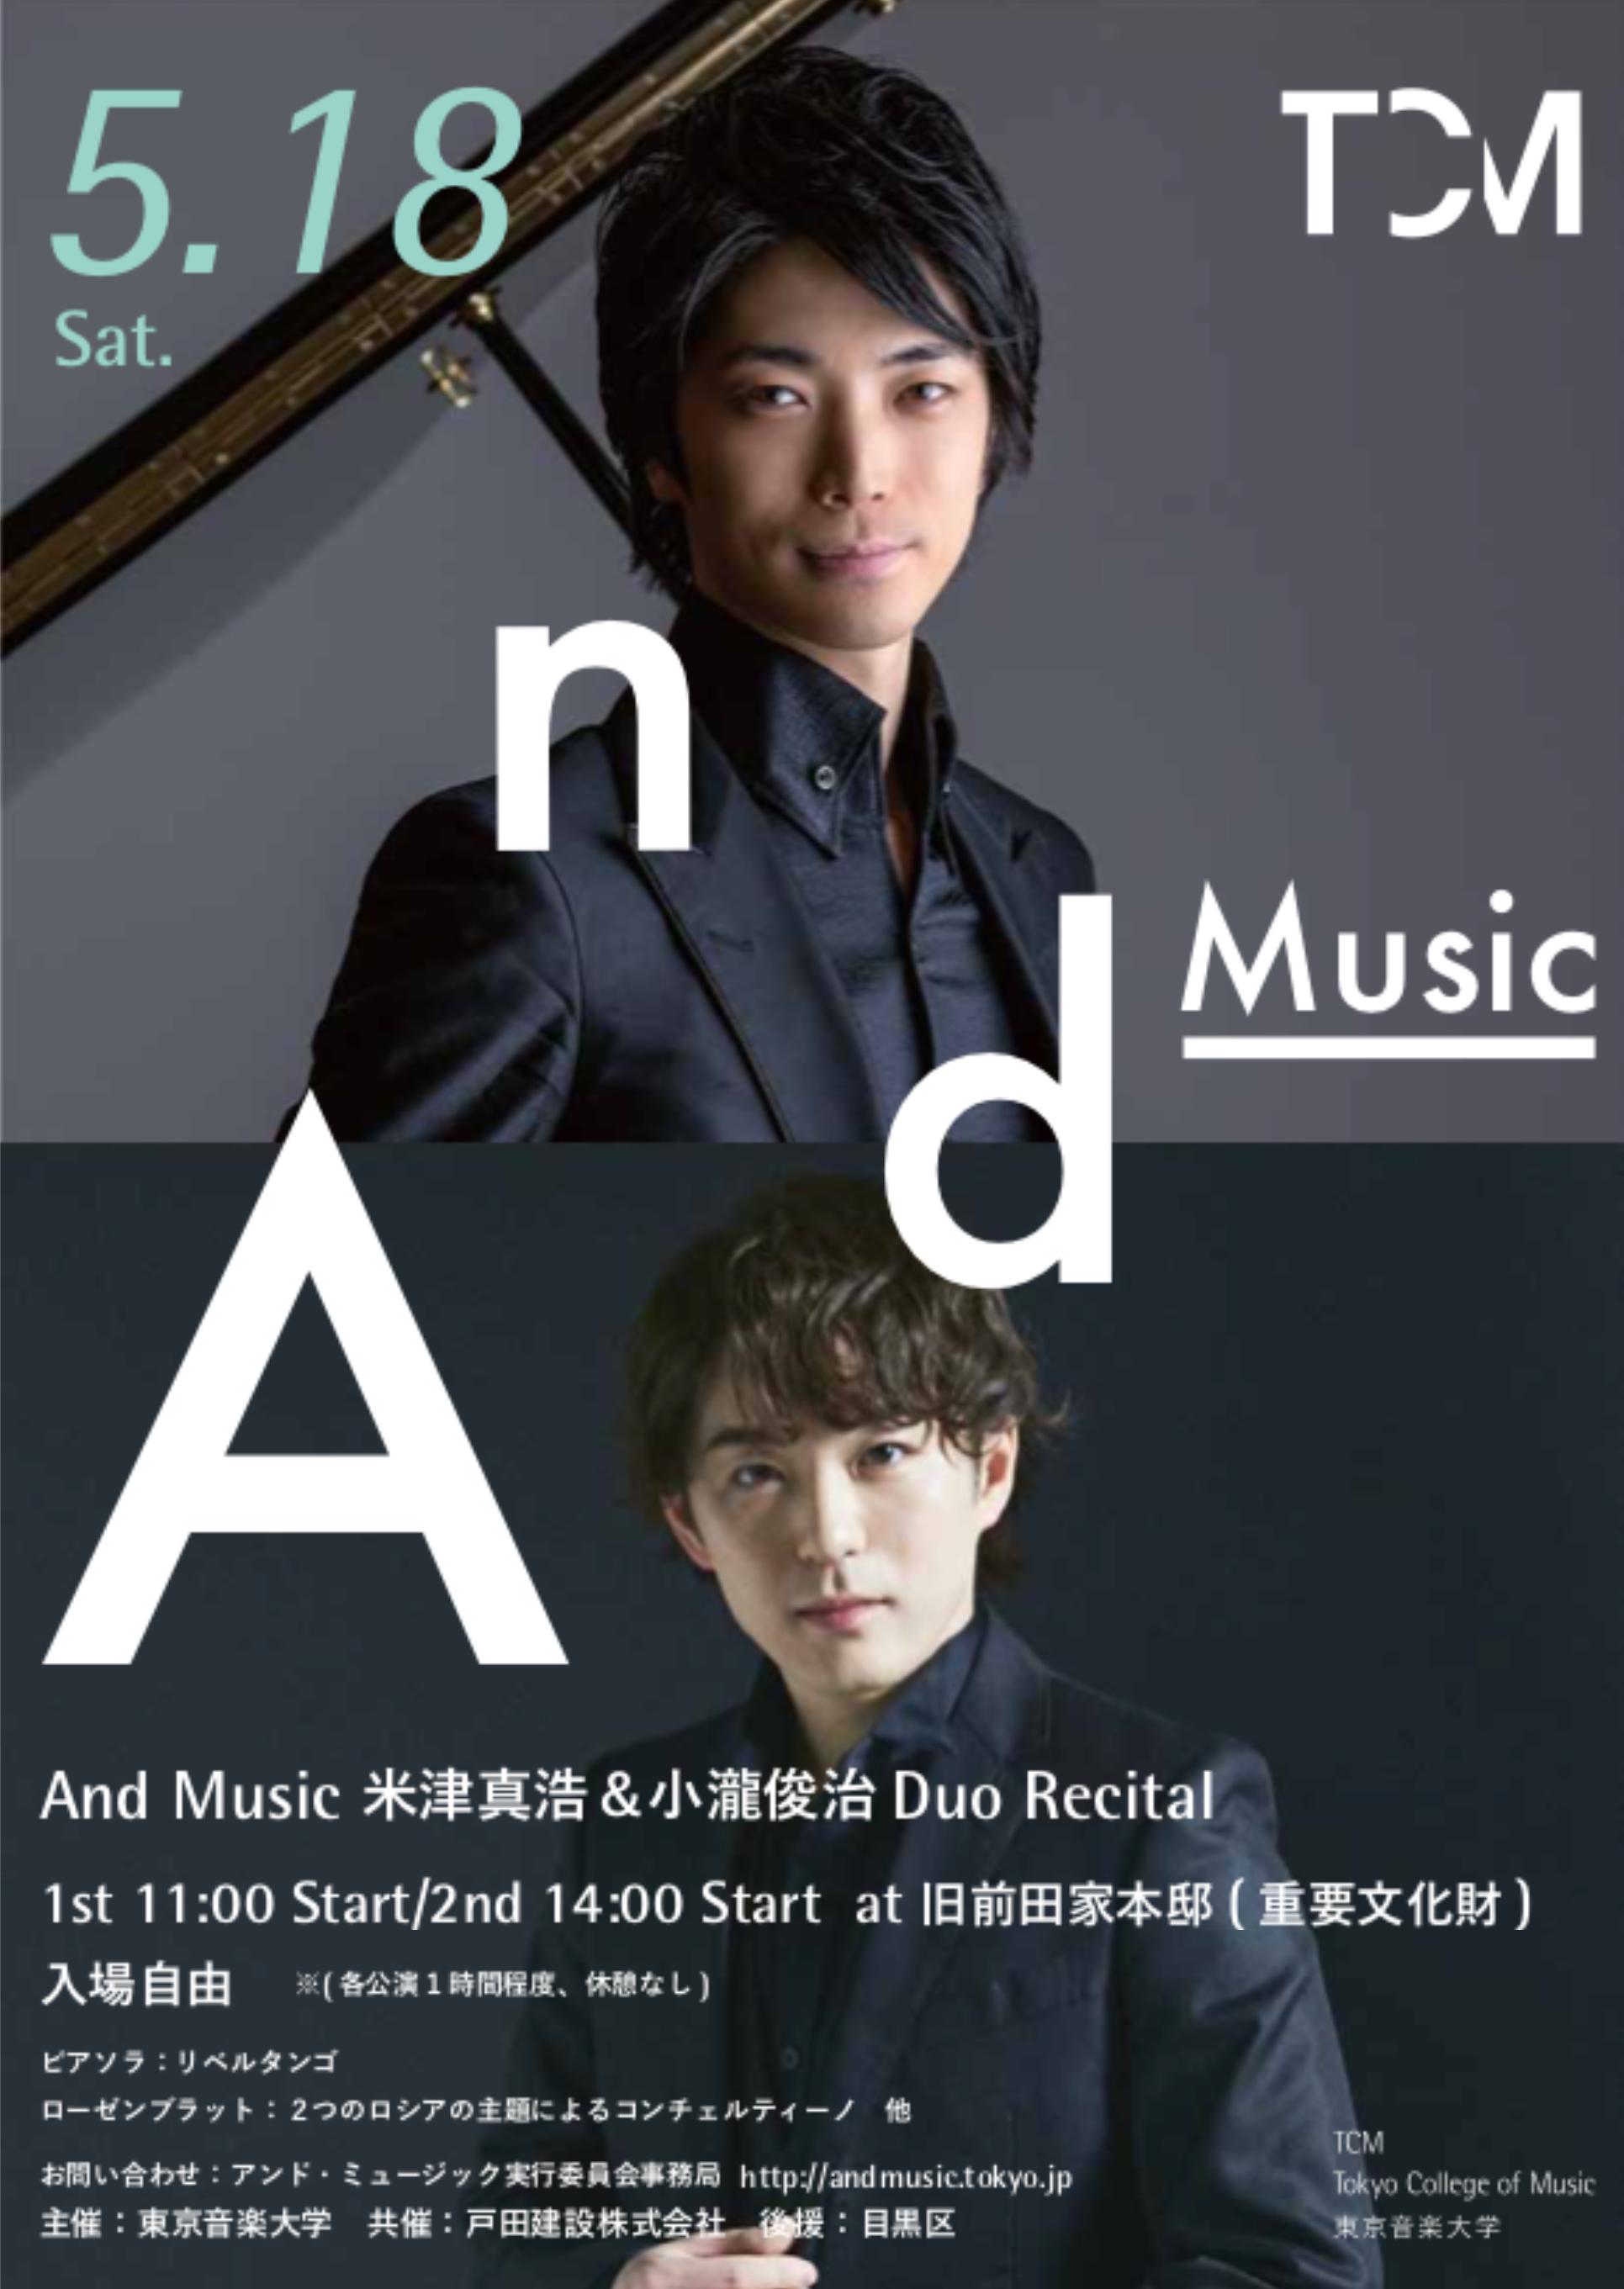 2019年5月18日(土)TCM And Music 米津真浩&小瀧俊治DUO RECITAL